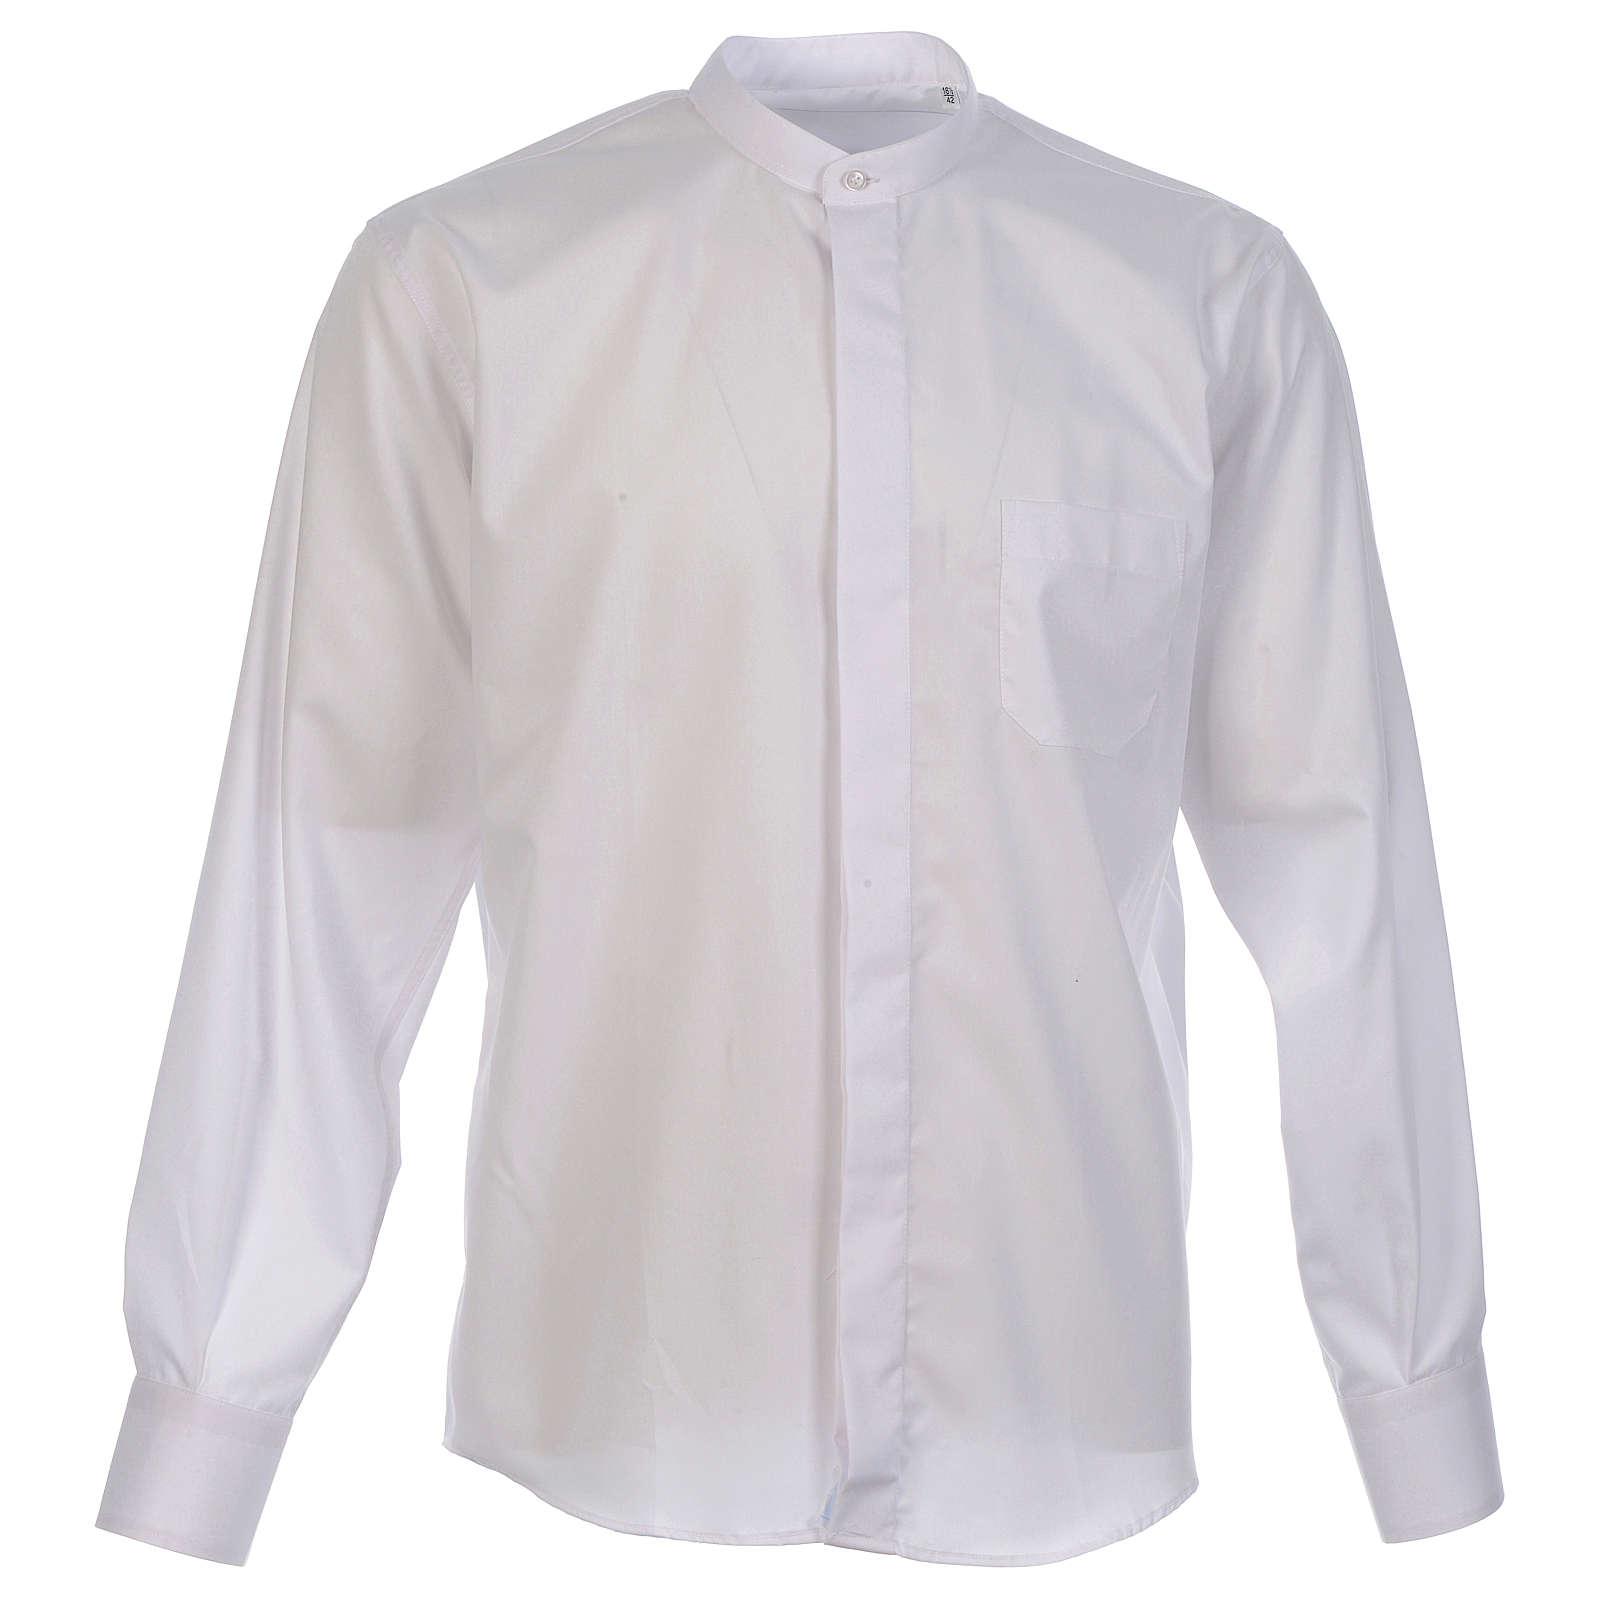 Camisa clergy batina colarinho coberto manga longa 4